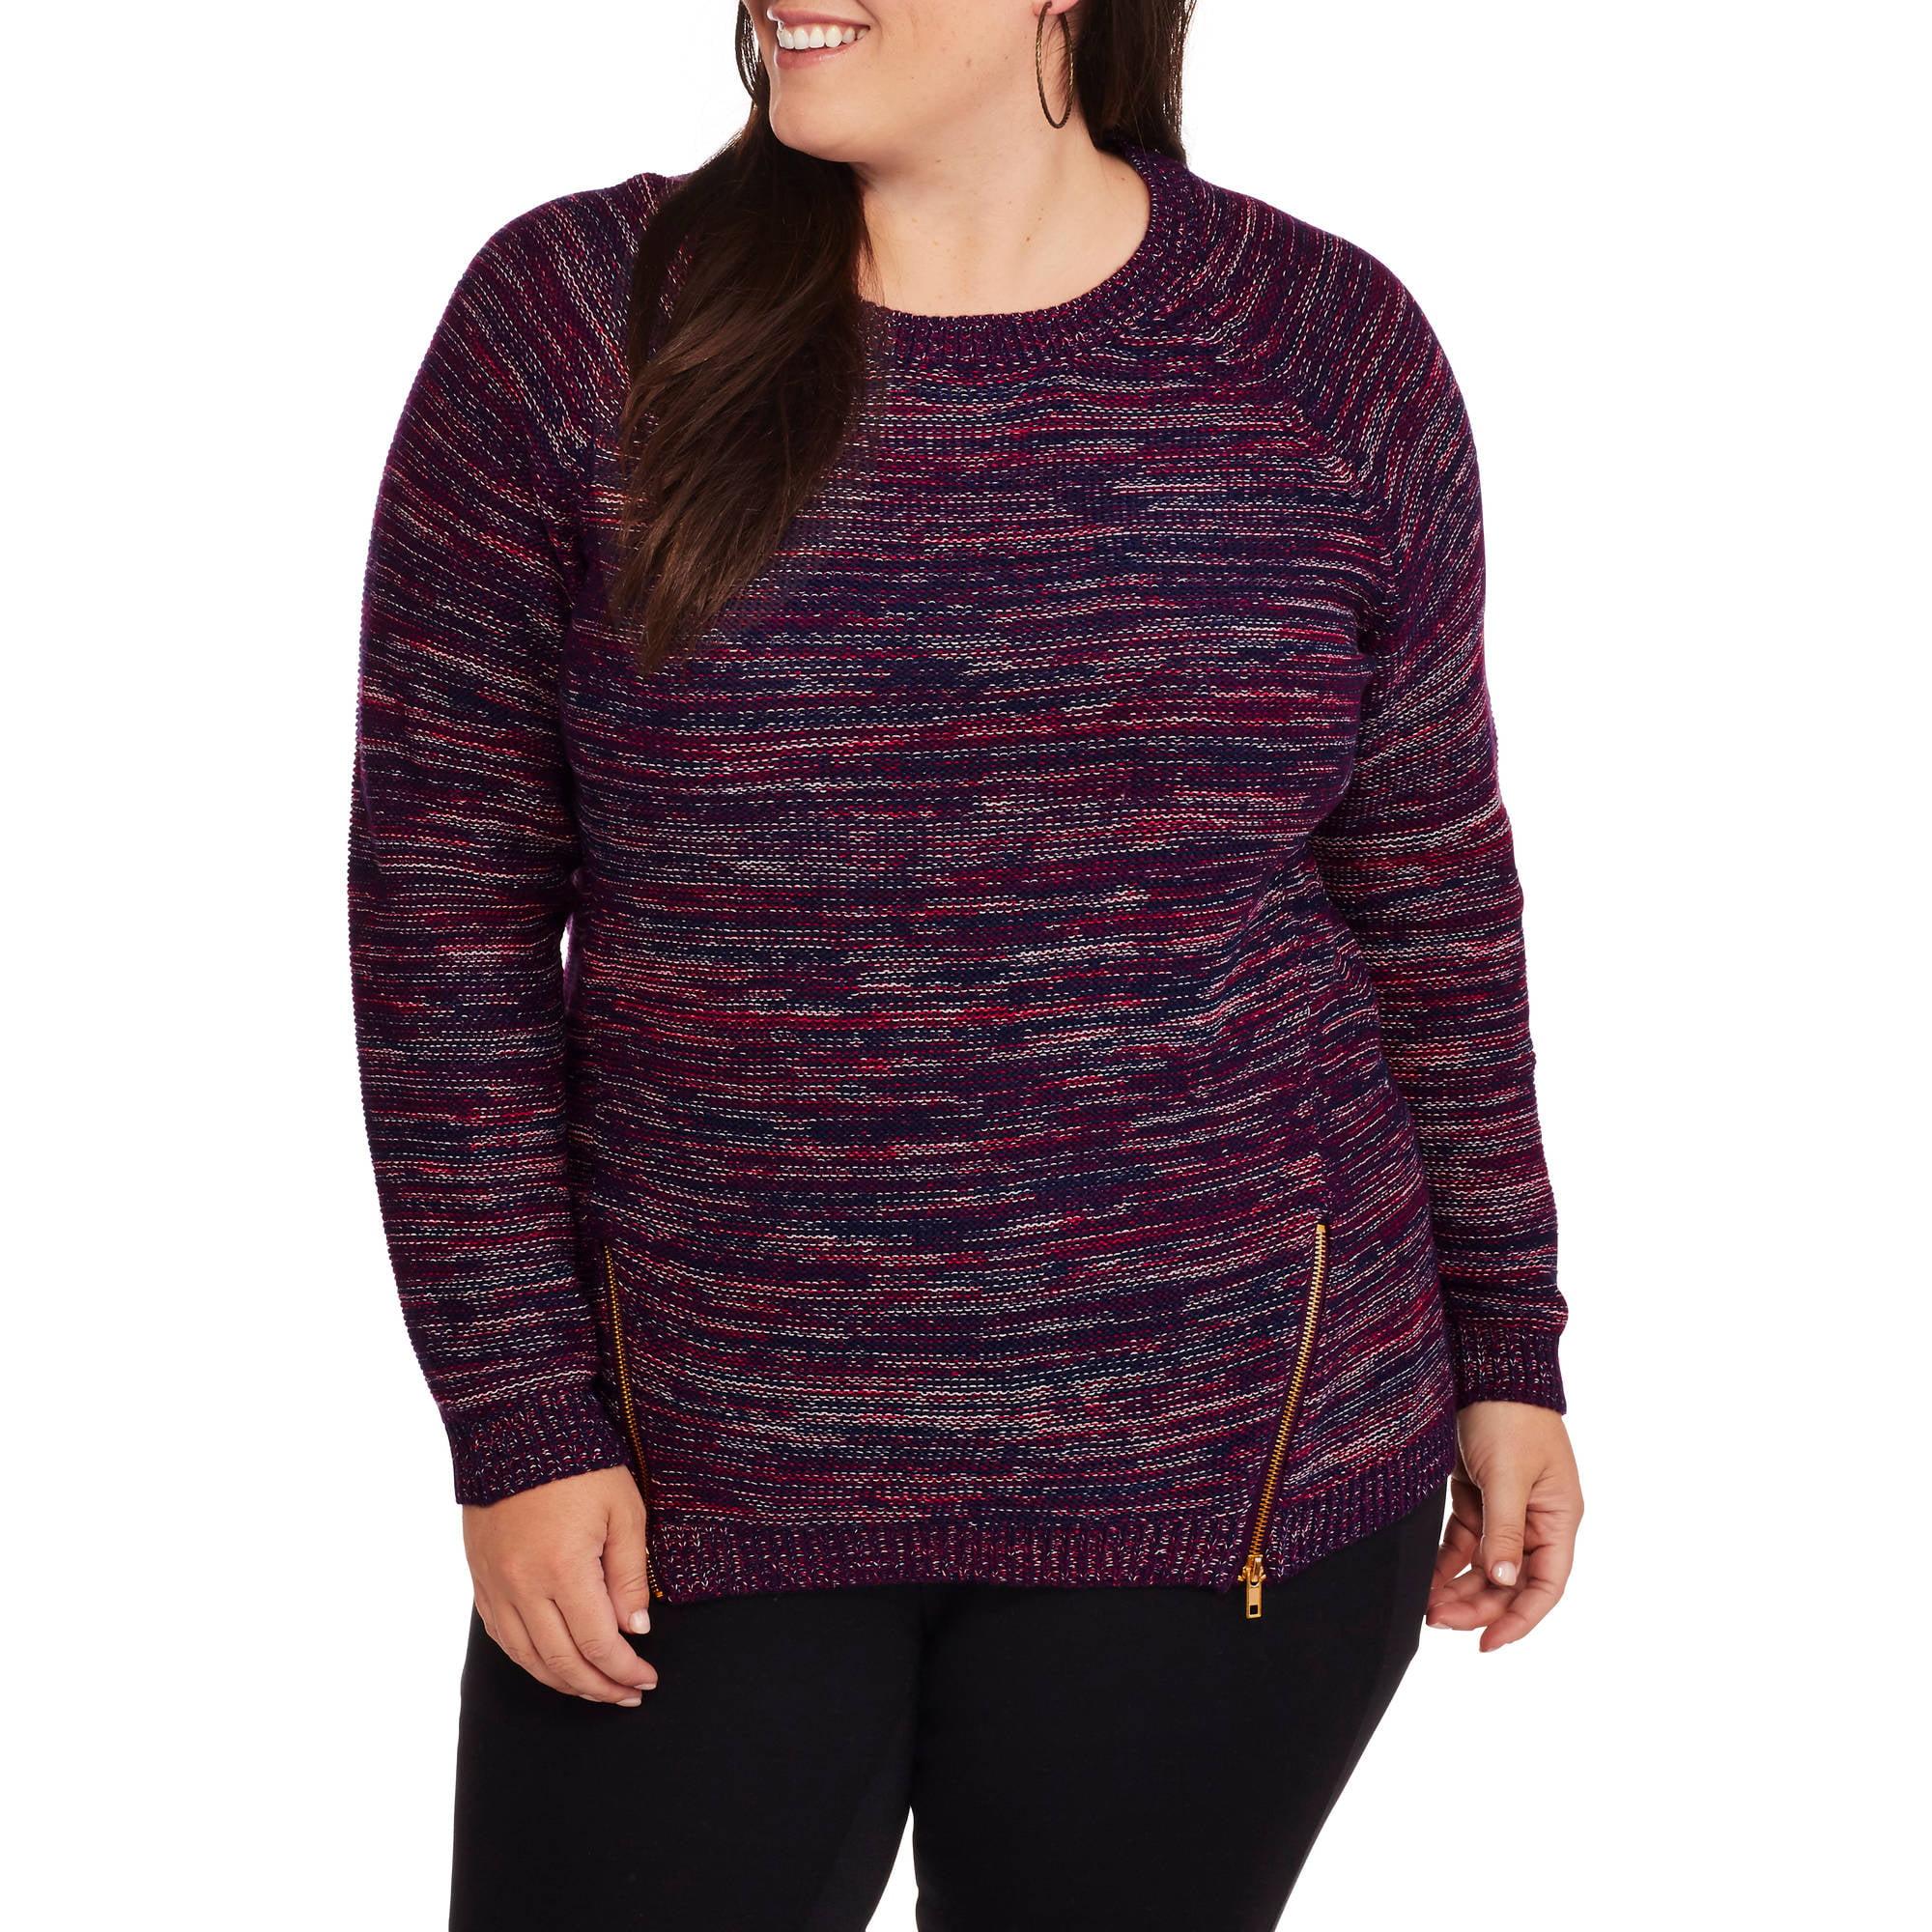 Heart and Crush Women's Plus Multi Knit Zip Side Sweater